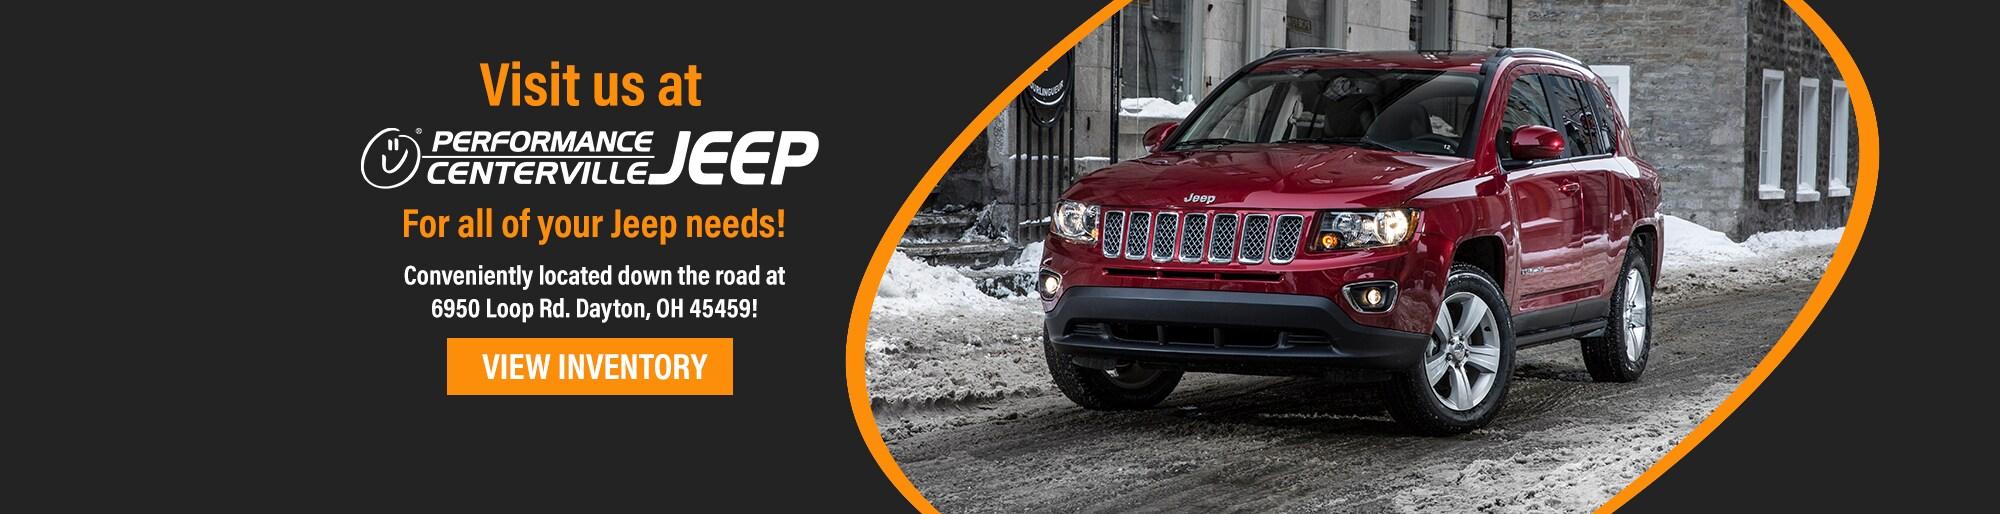 Performance Chrysler Dodge Ram Centerville Jeep Wrangler Parts Book Previous Next